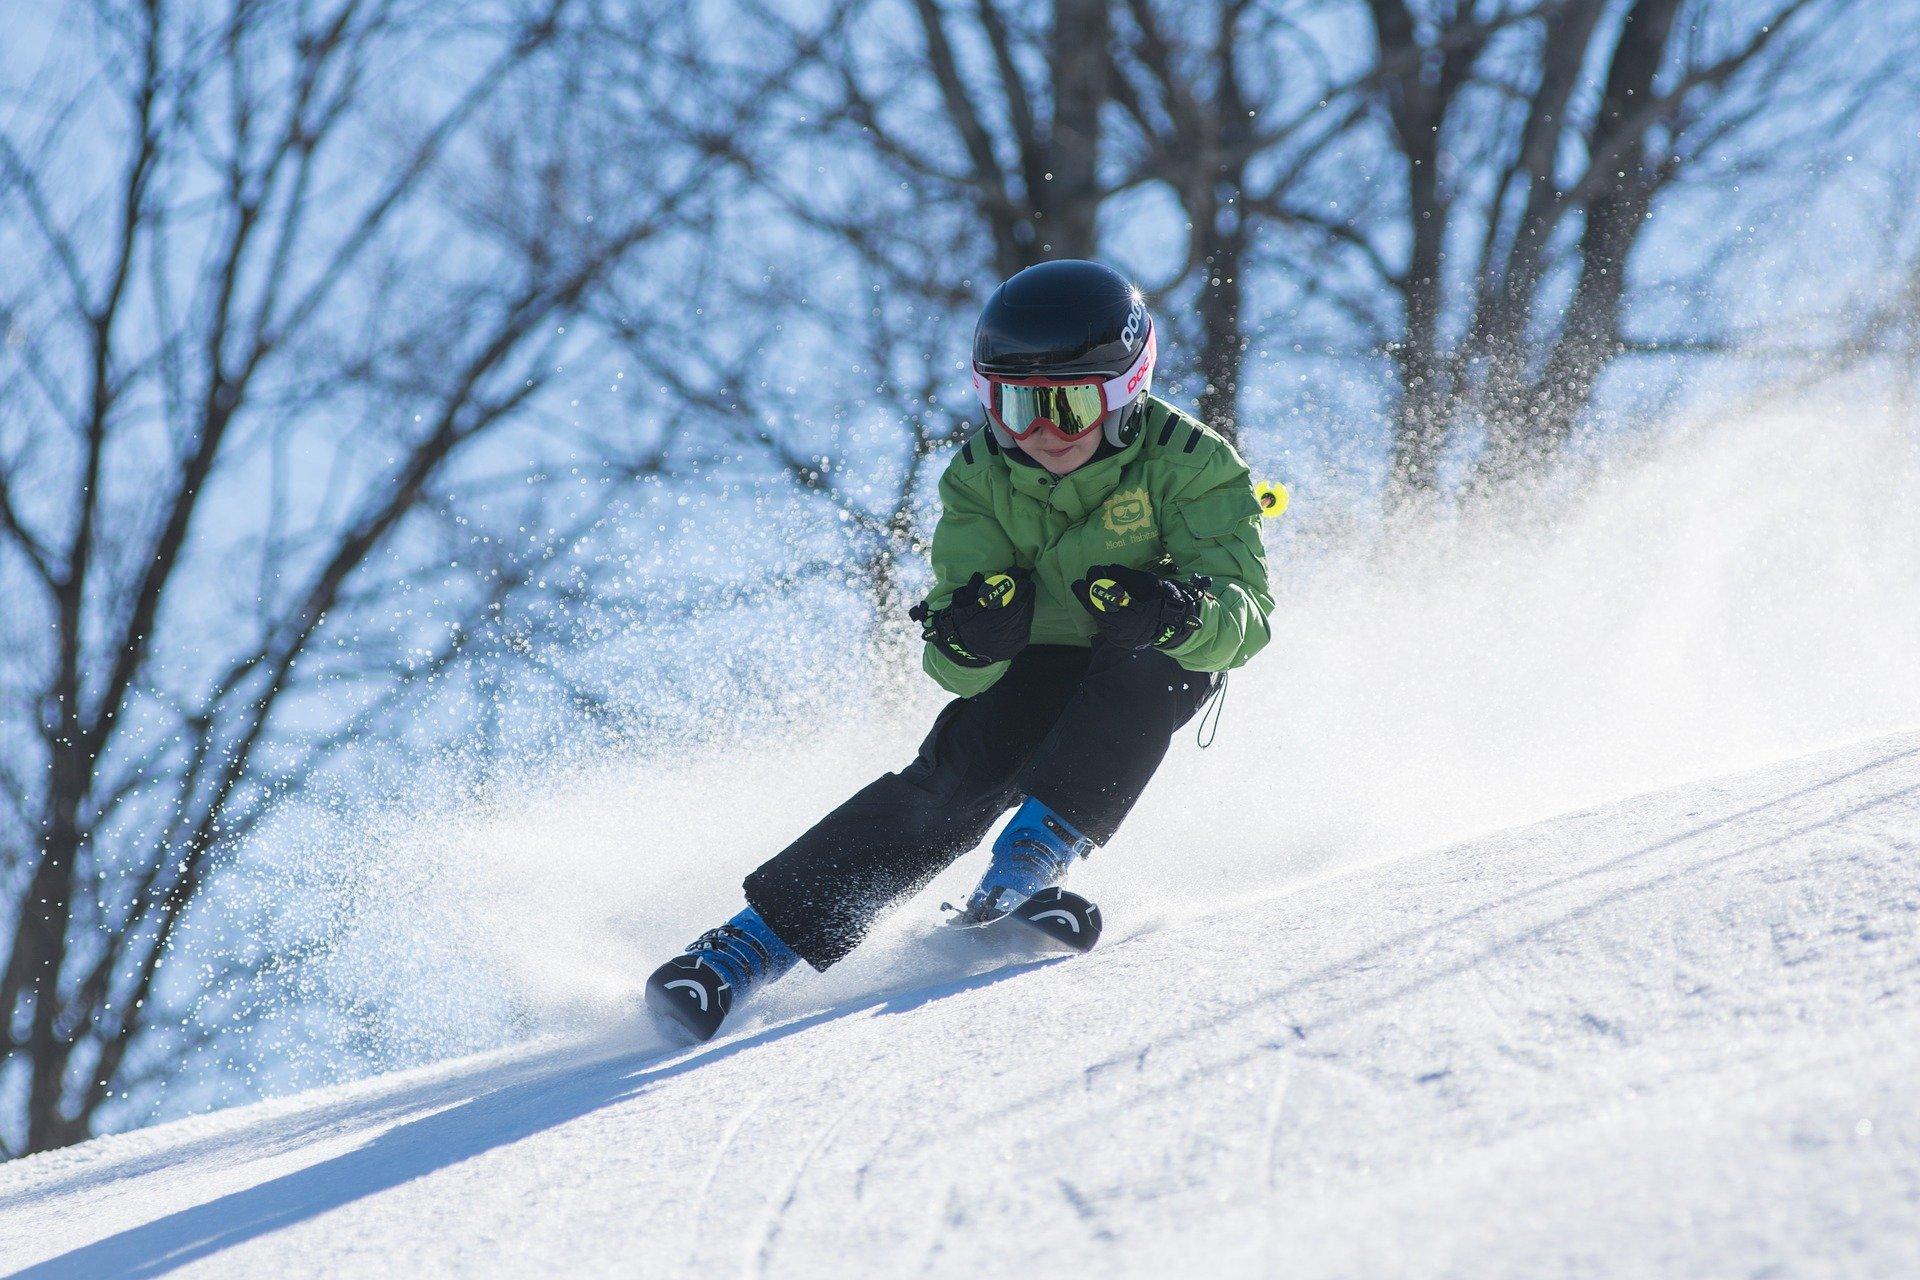 Un jeune garçon faisant du ski